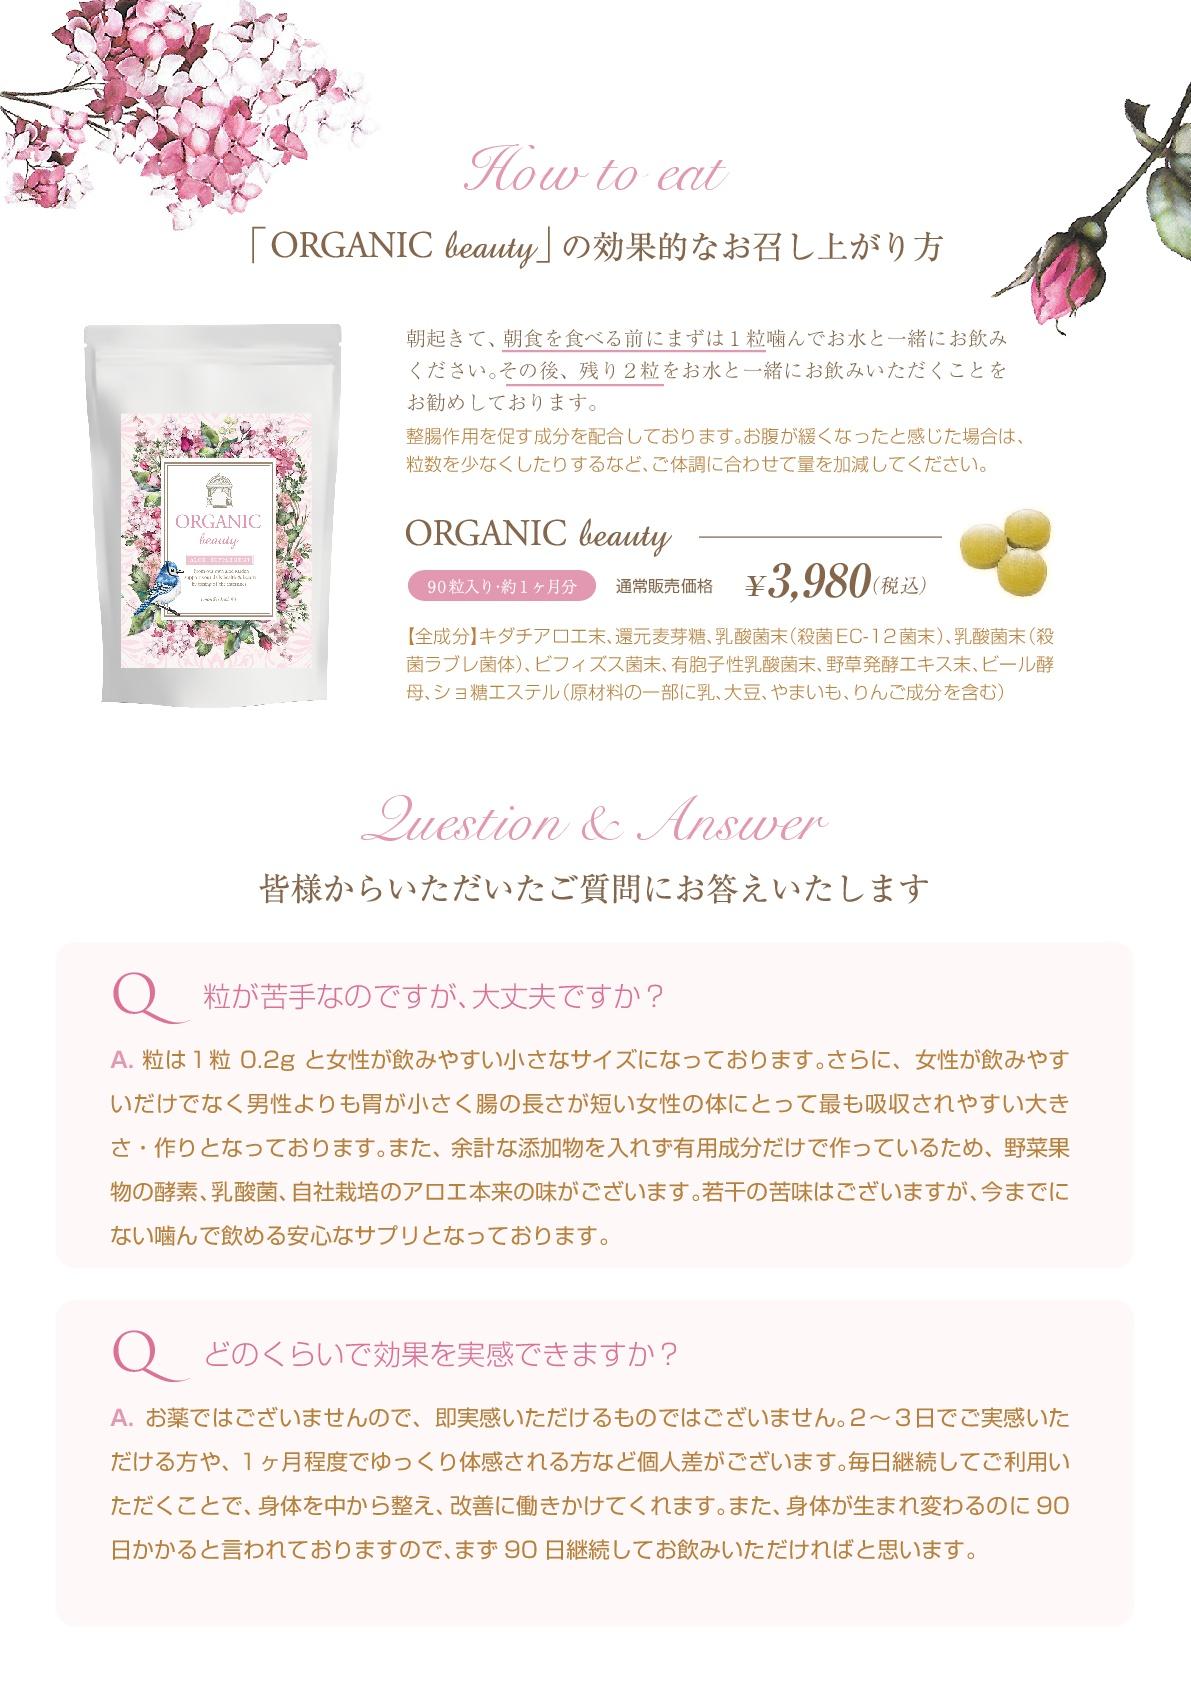 ORGANIC-beauty-006.jpg